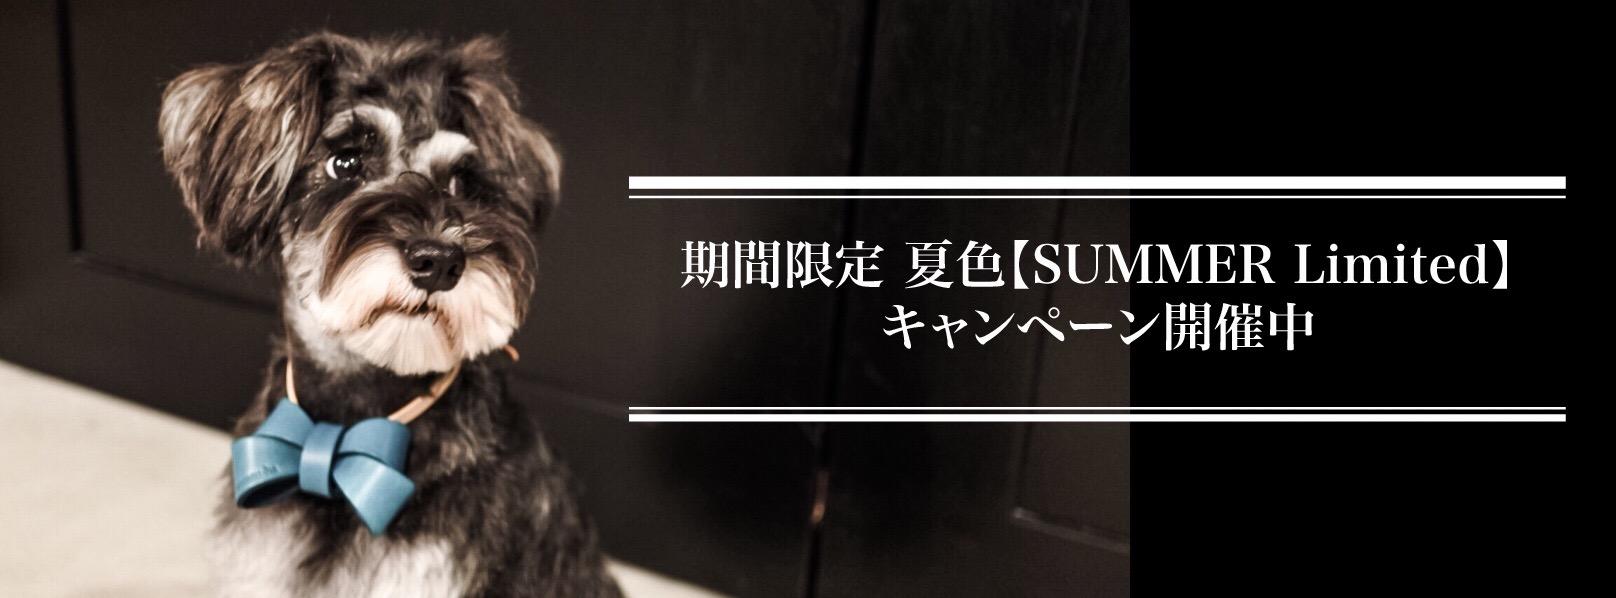 mmsu-ha夏限定首輪リード迷子札キーホルダー